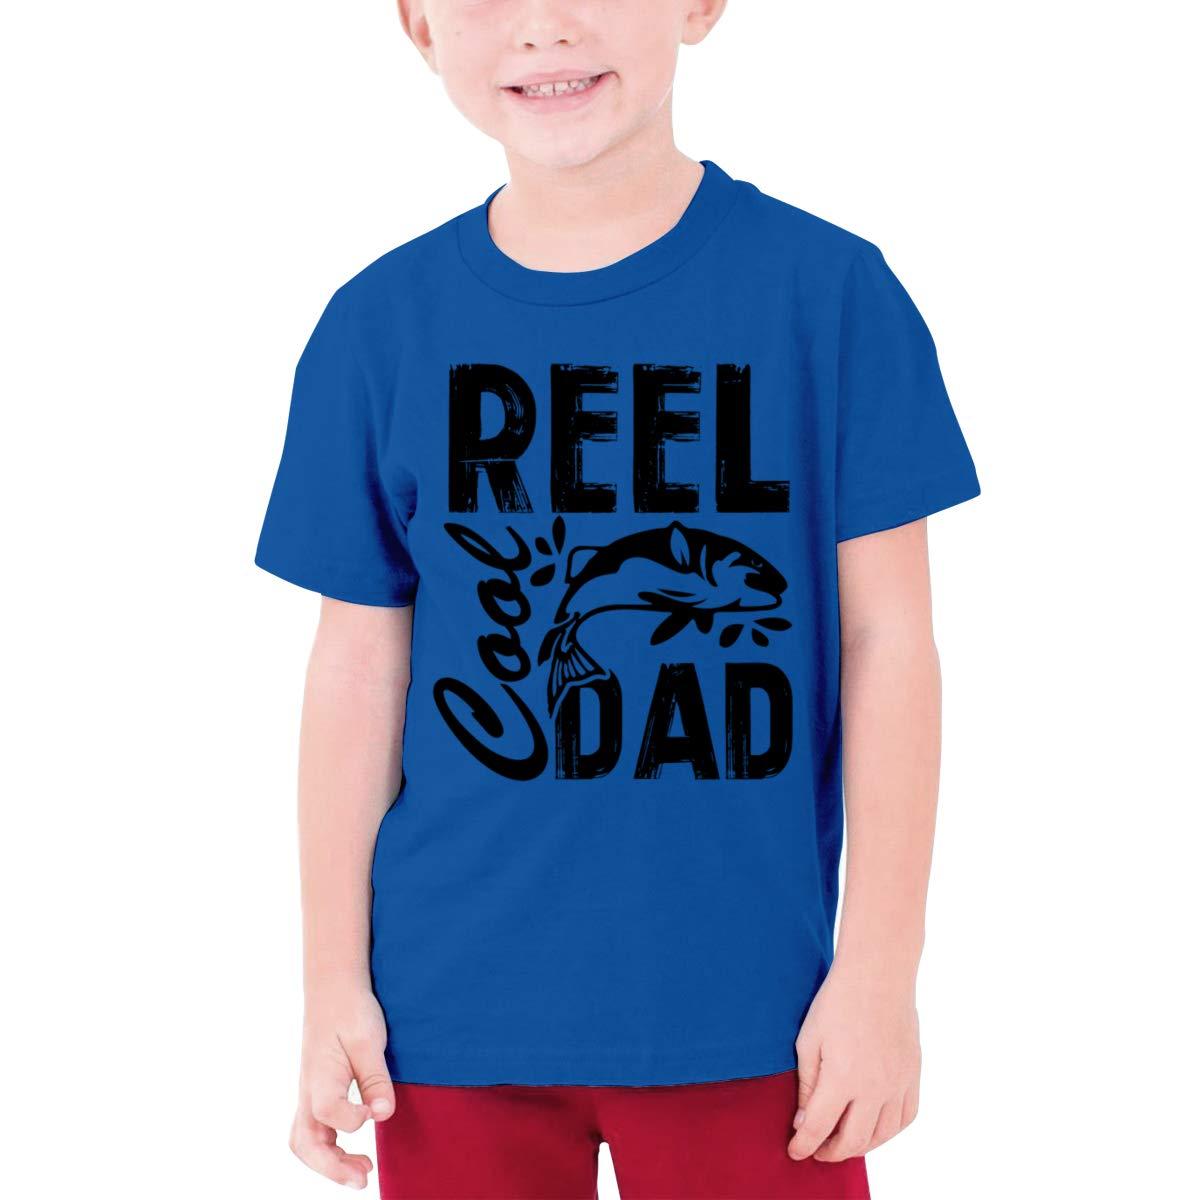 Negi Reel Cool Dad Boy Short-Sleeved Tee